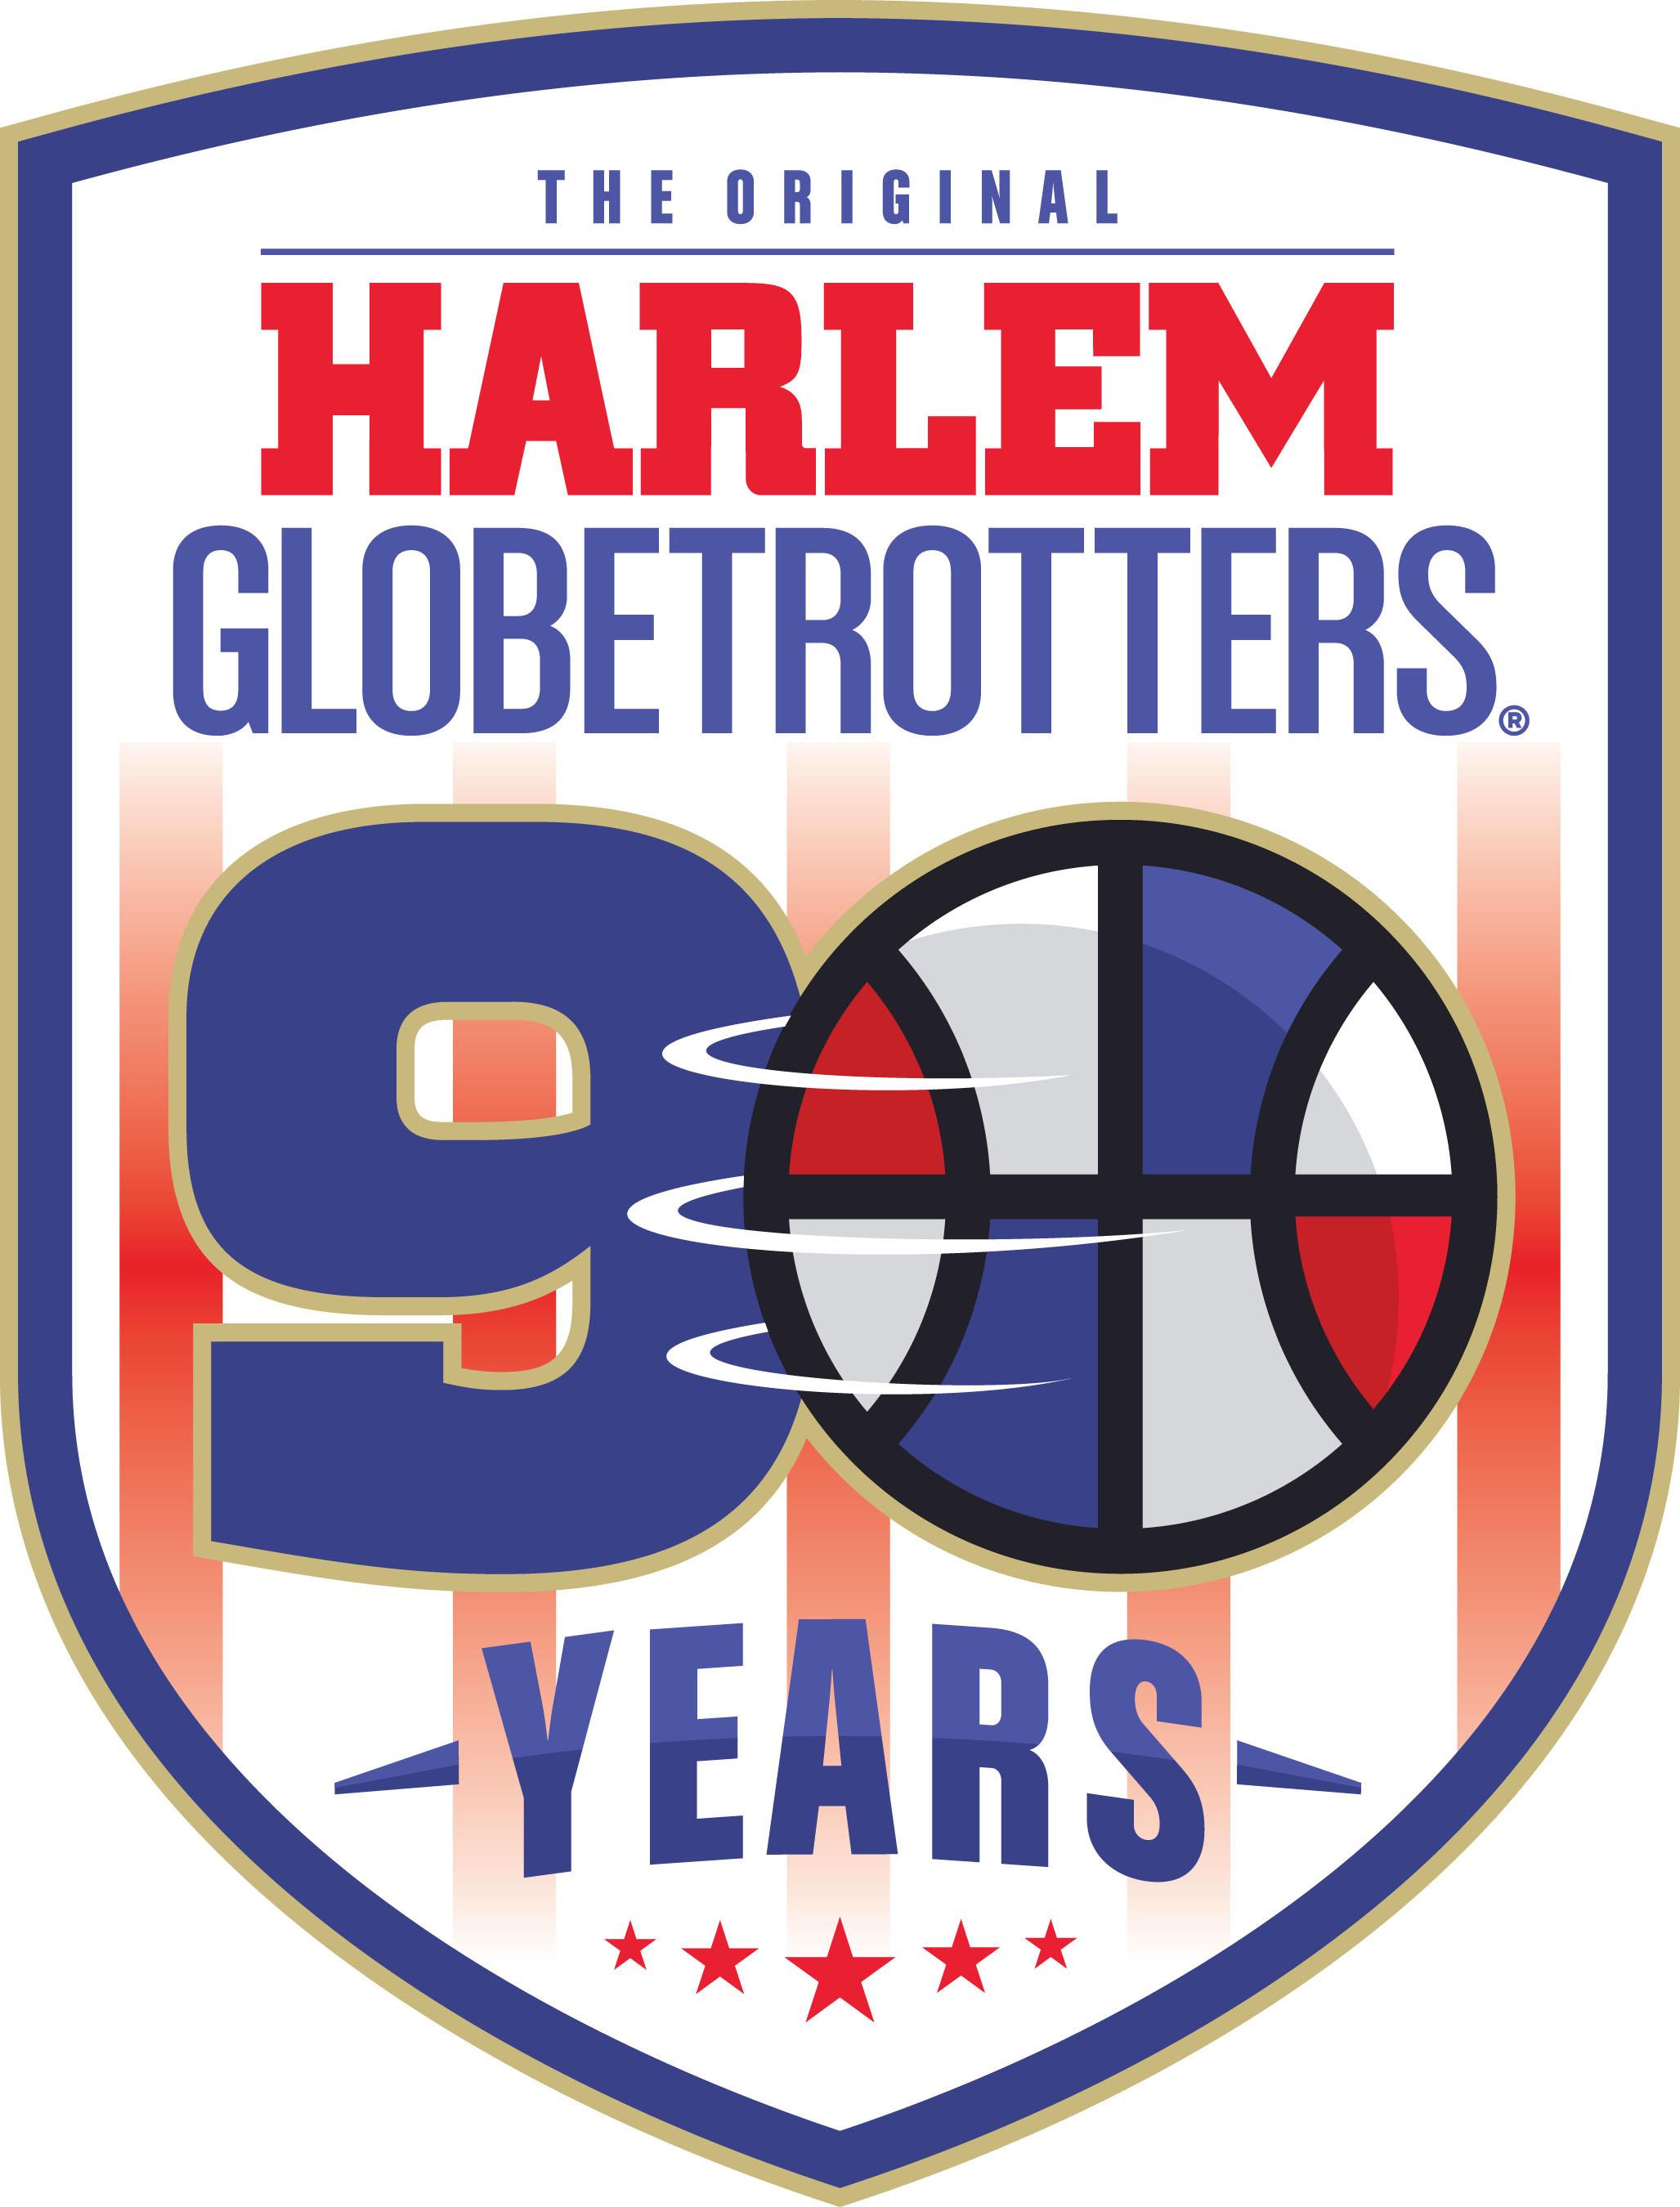 The Harlem Globetrotters logo